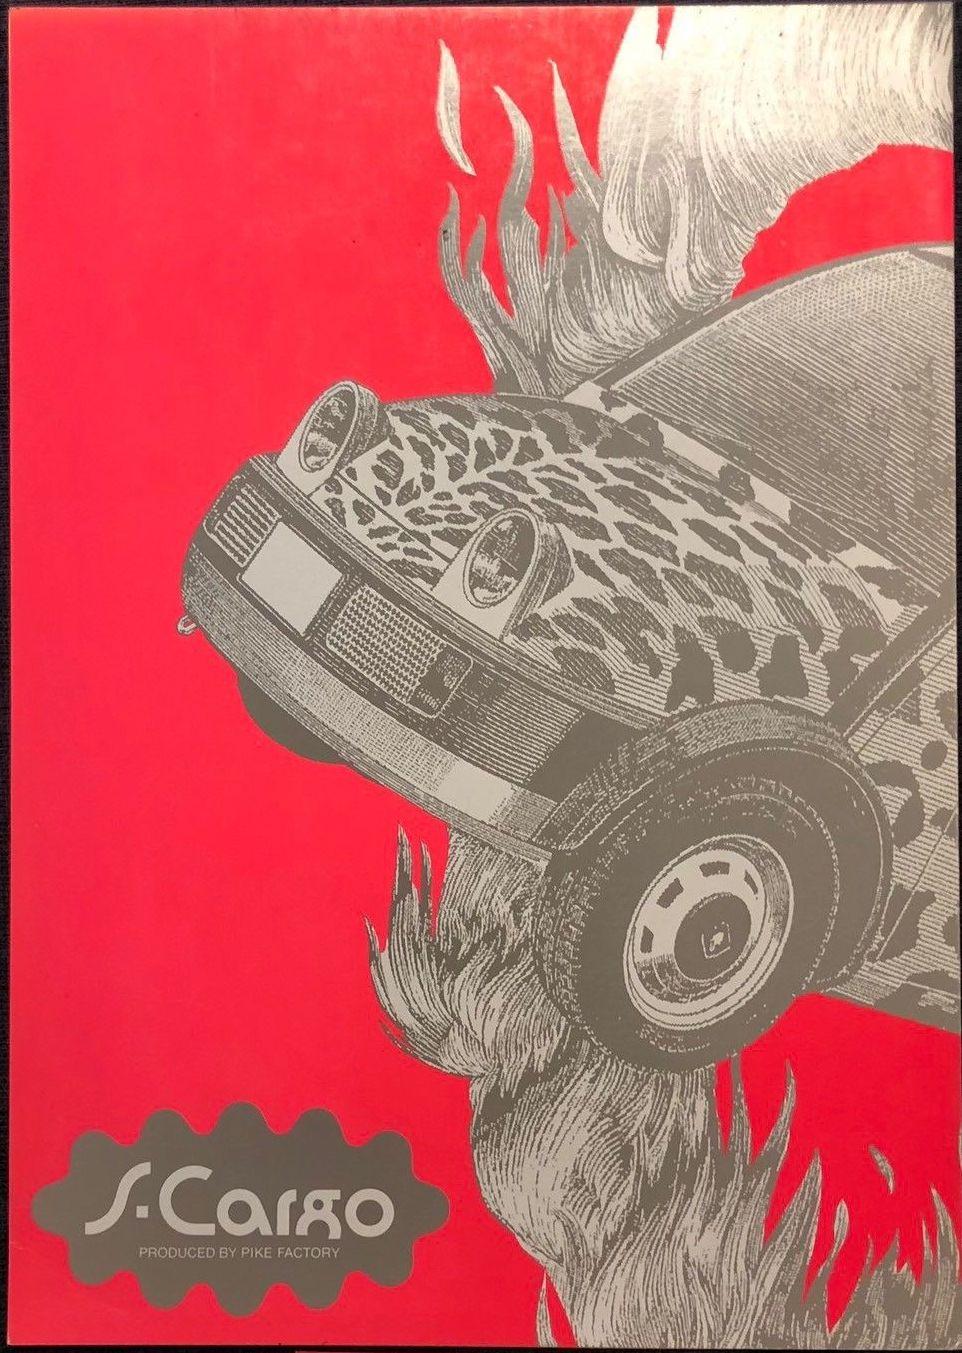 Nissan S Cargo advertisement poster